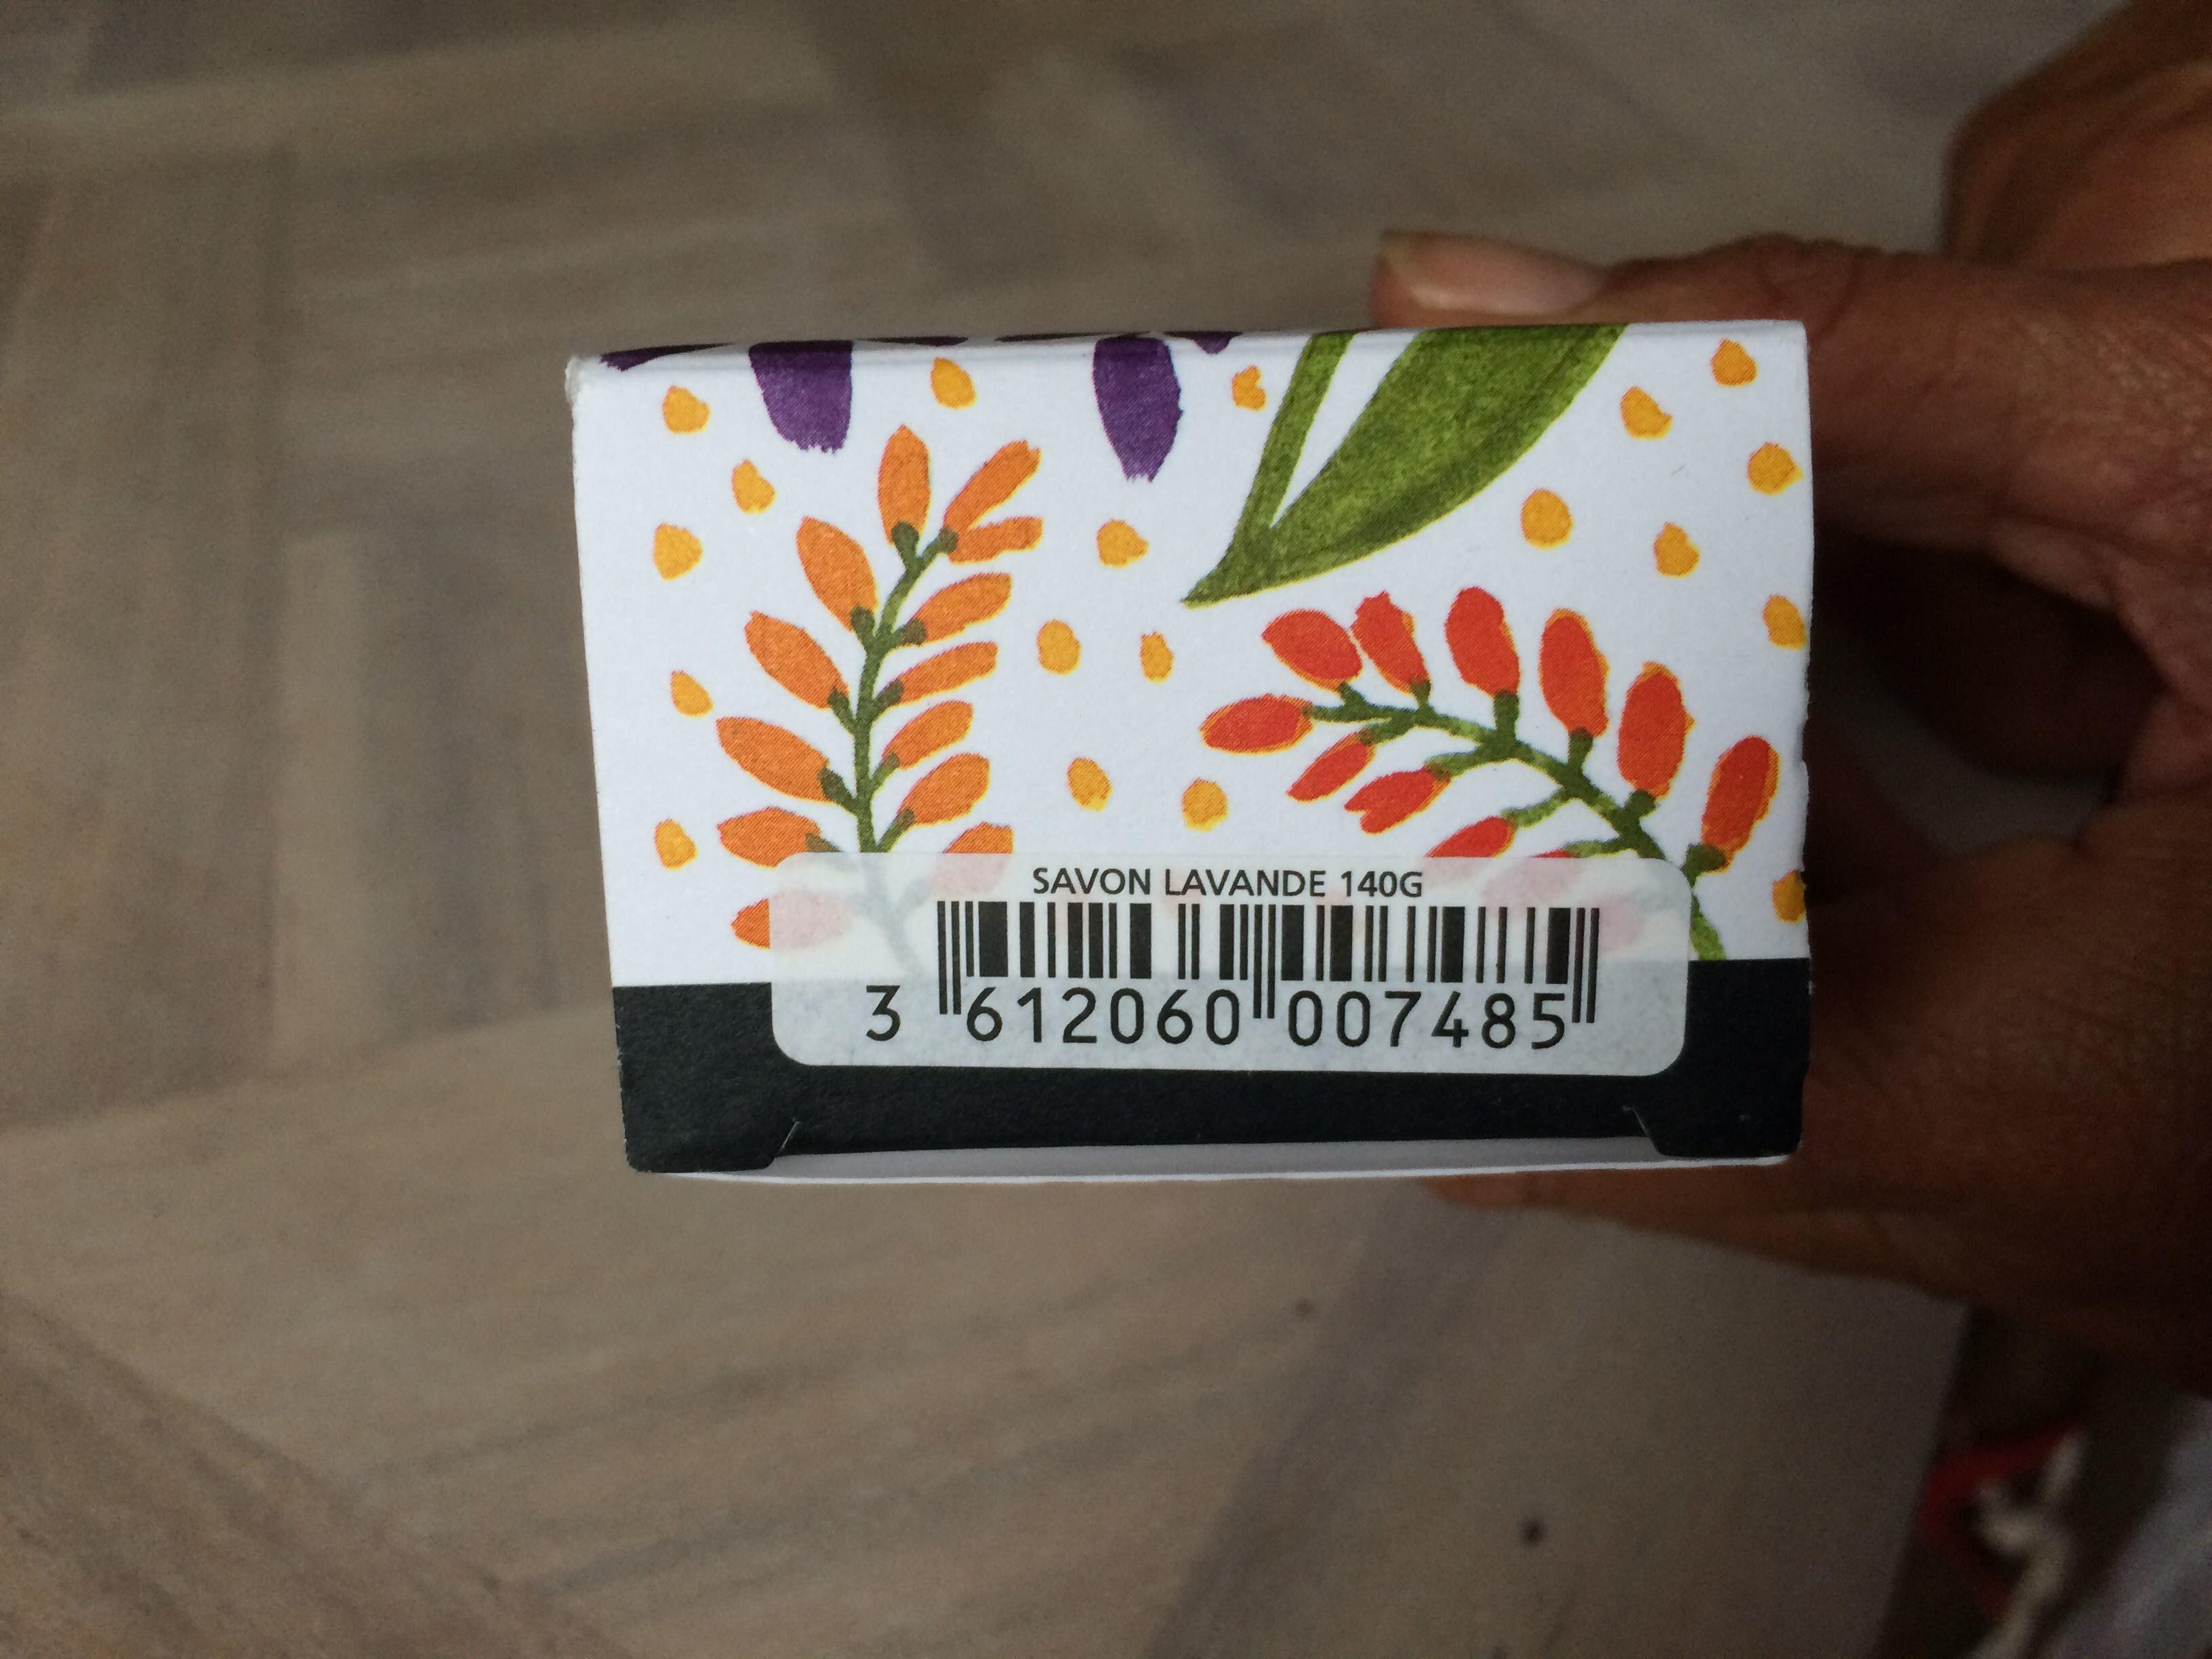 Savon Parfumé - Product